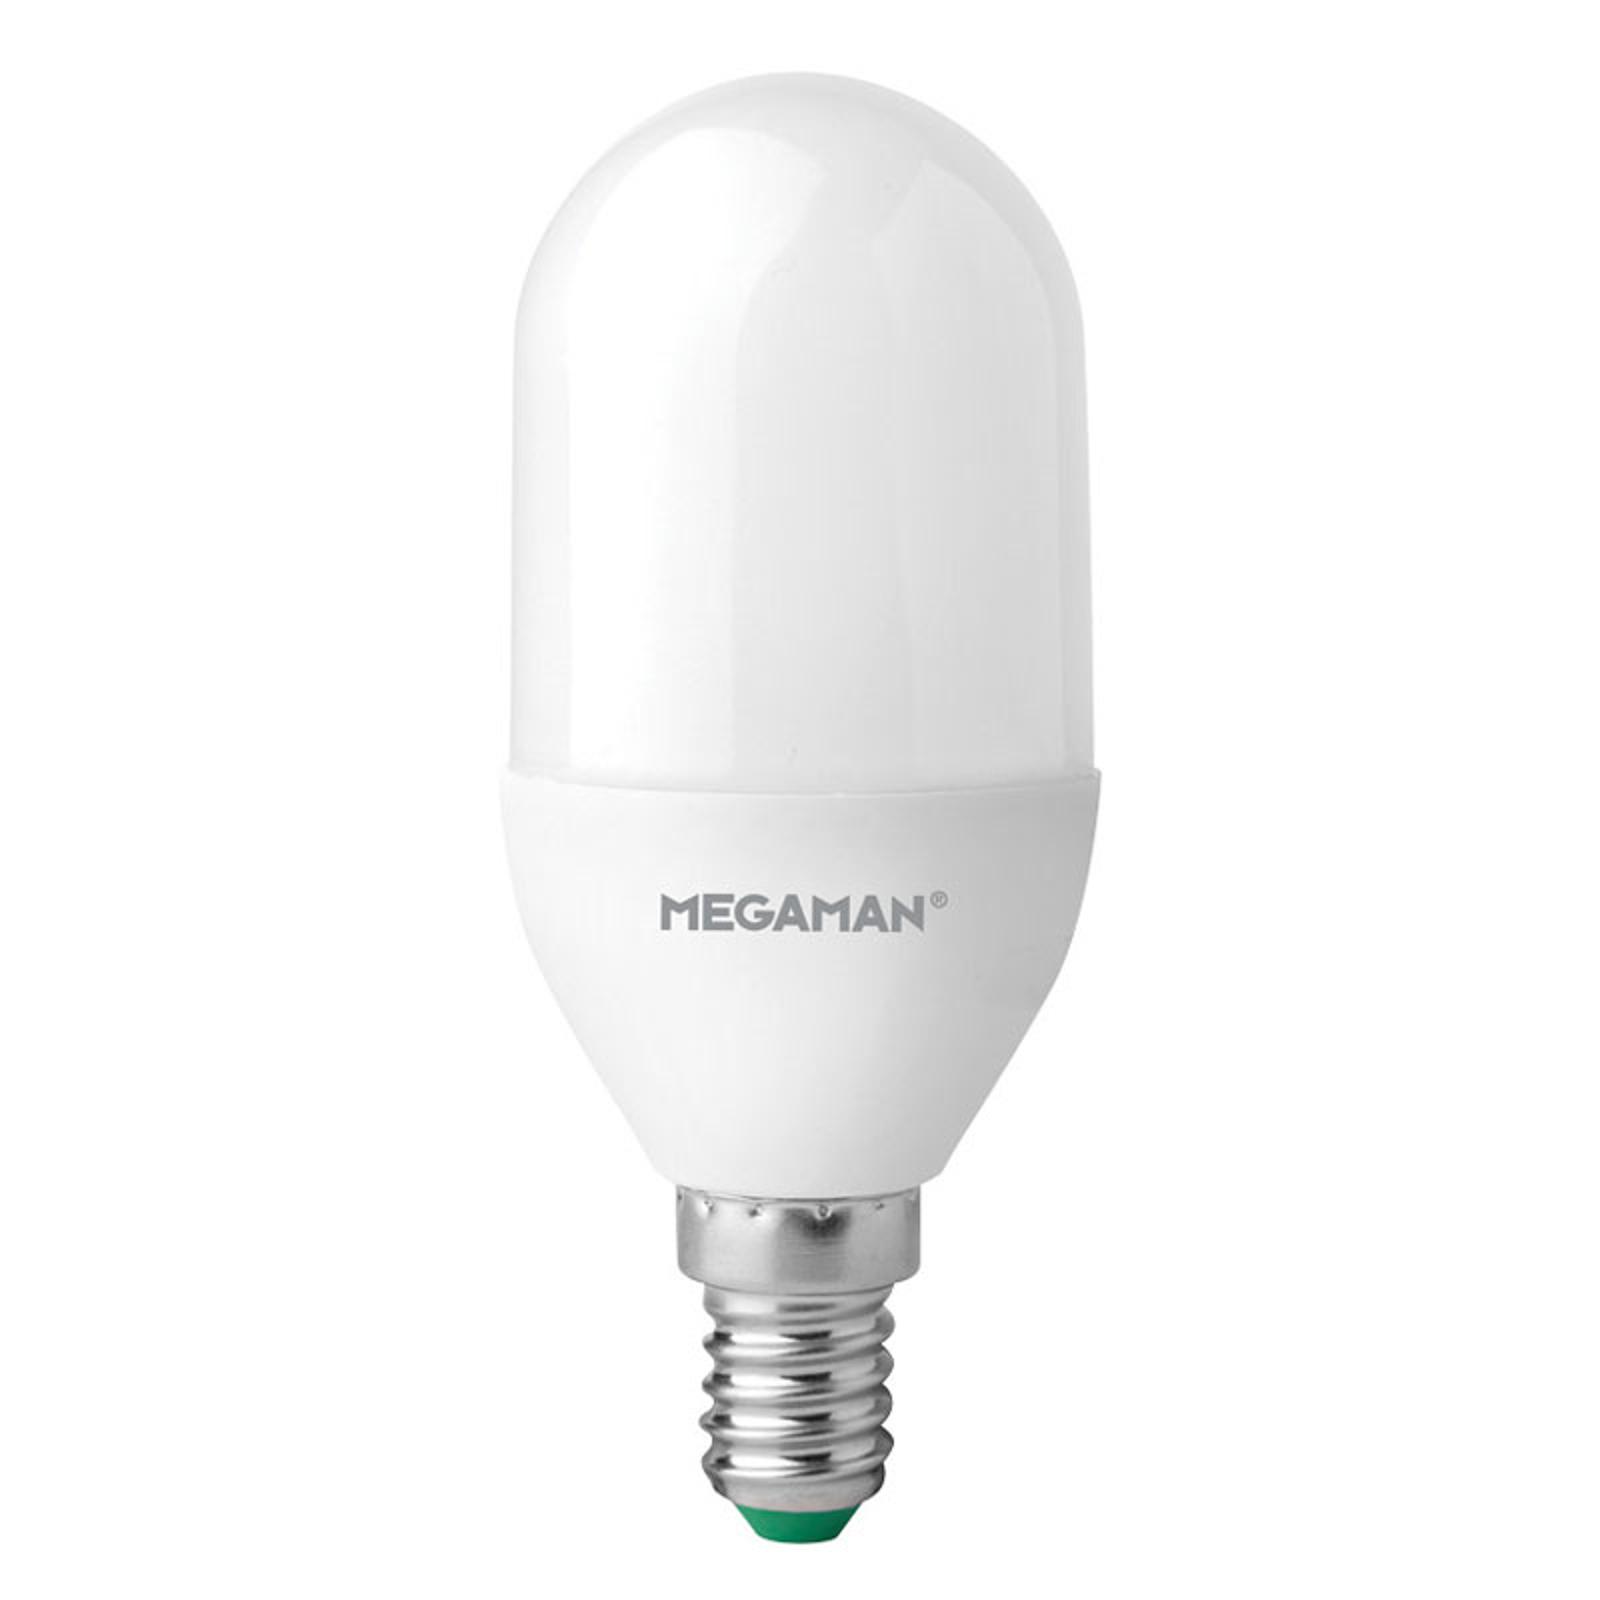 LED Lampe E14 Kolben 7W, warmweiß